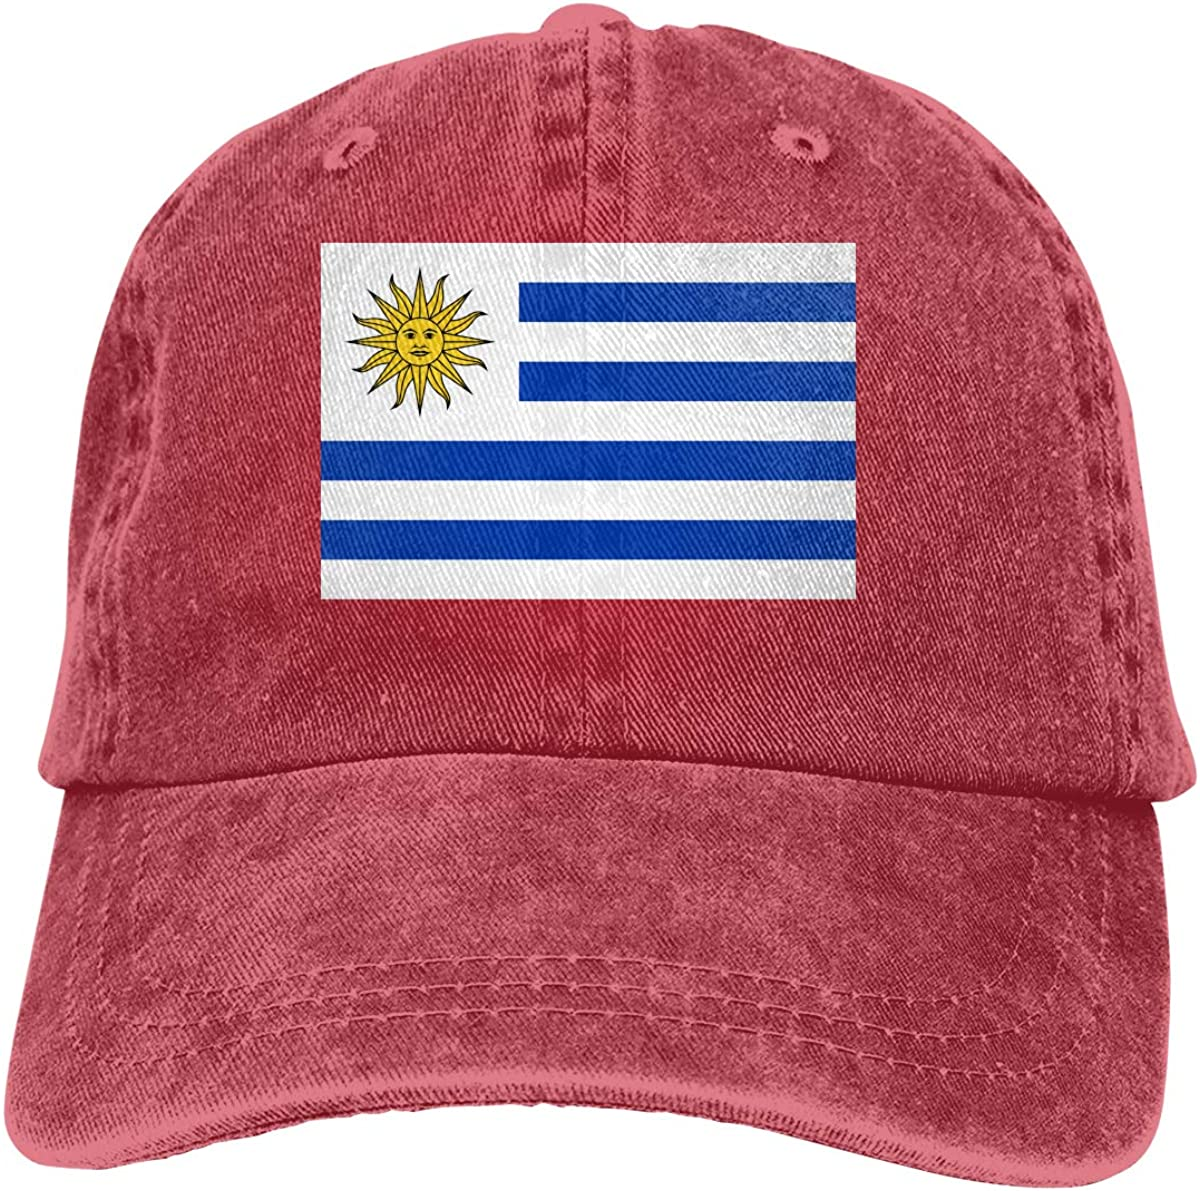 PMGM-C Uruguay Flag Unisex Trendy Jeans Hip Hop Cap Adjustable Baseball Cap